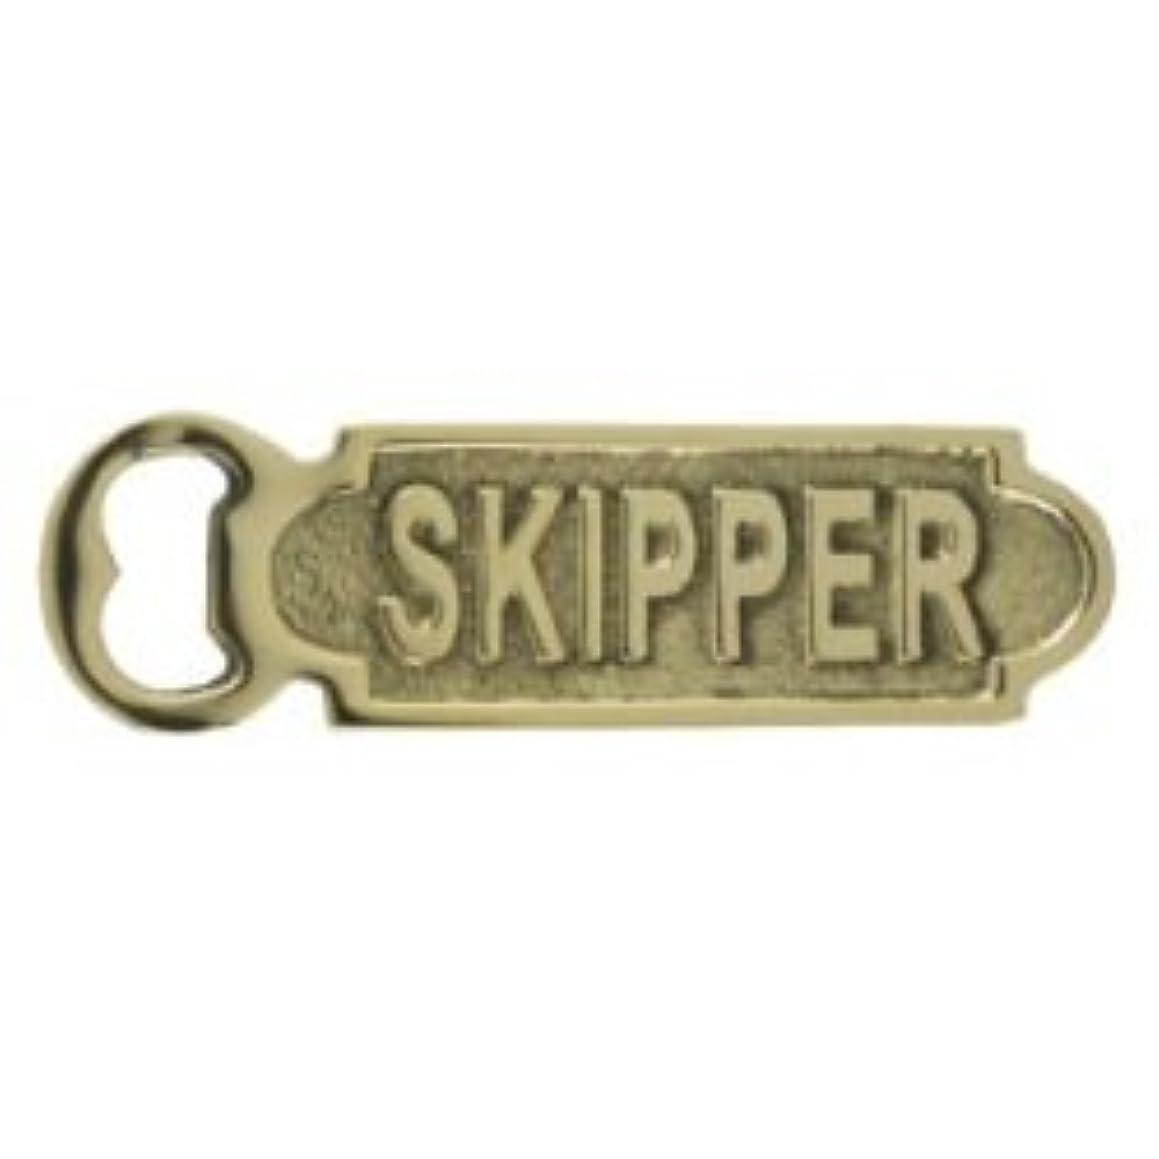 Skipper Bottle Opener by Nantucket Brand